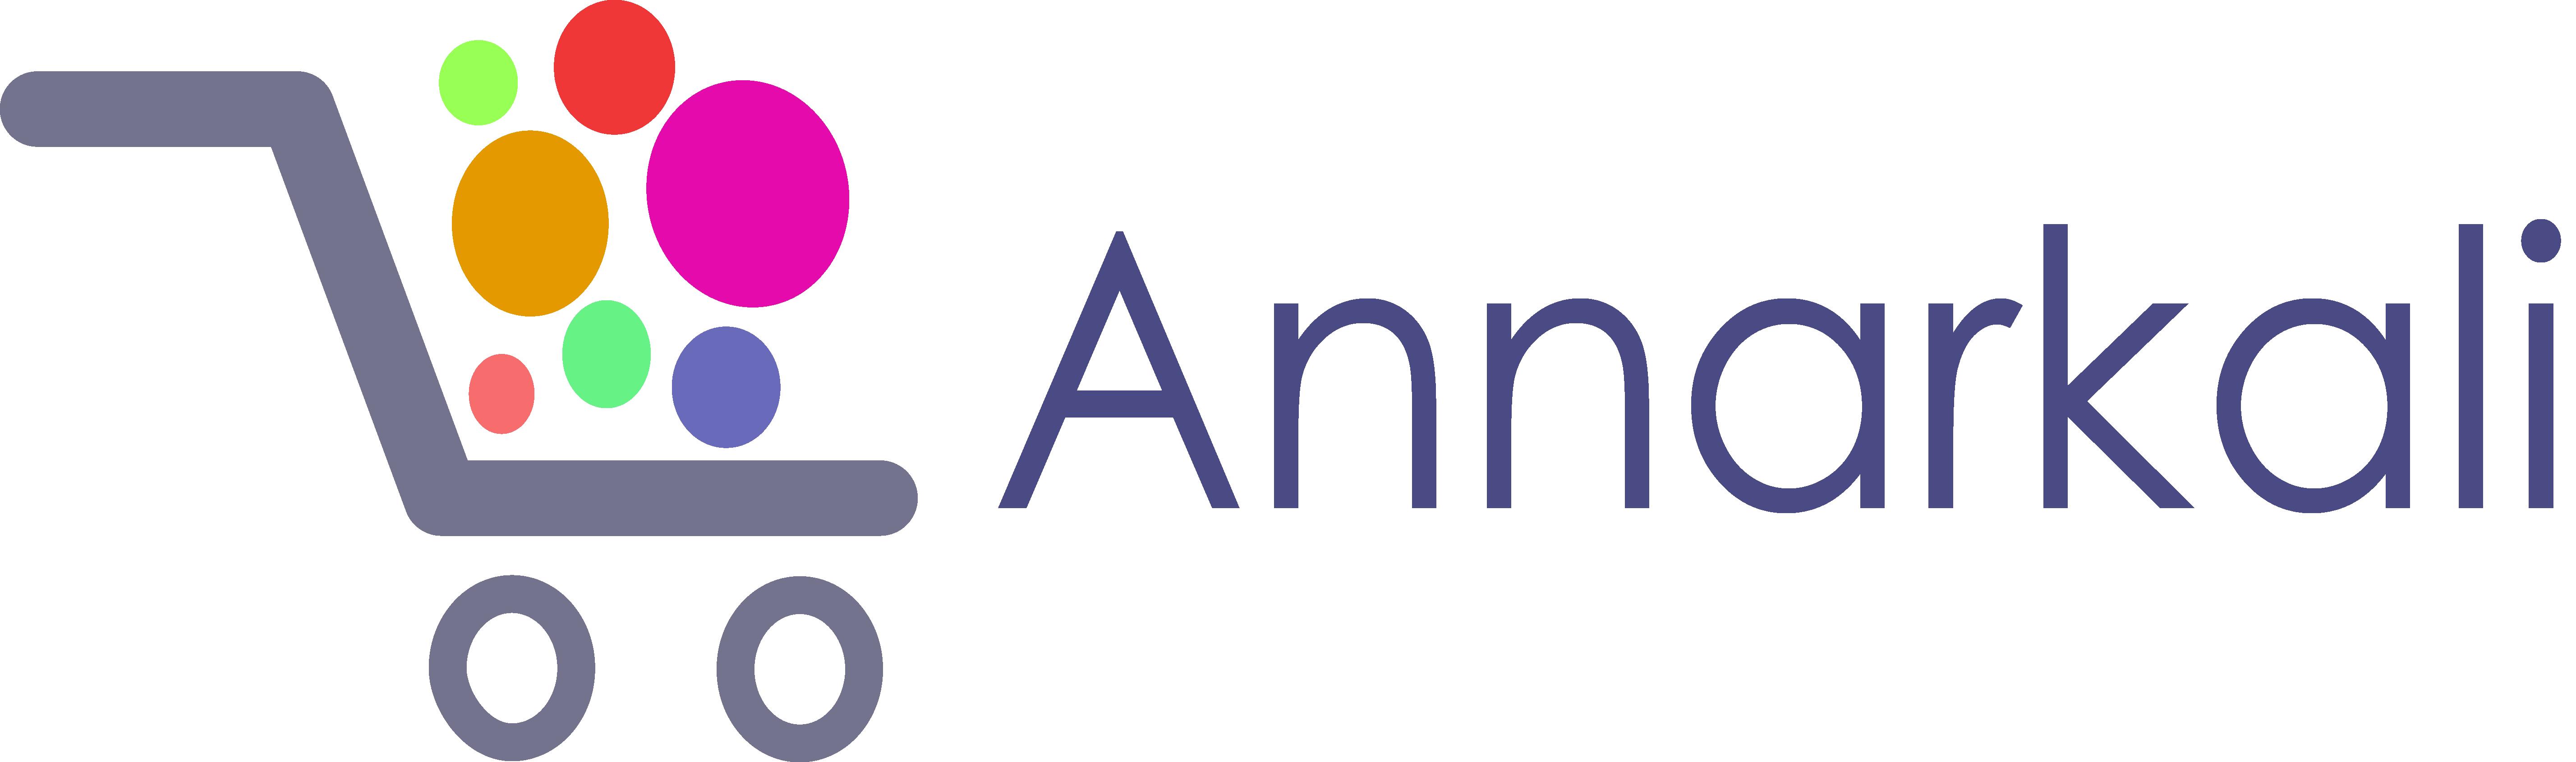 Annarkali